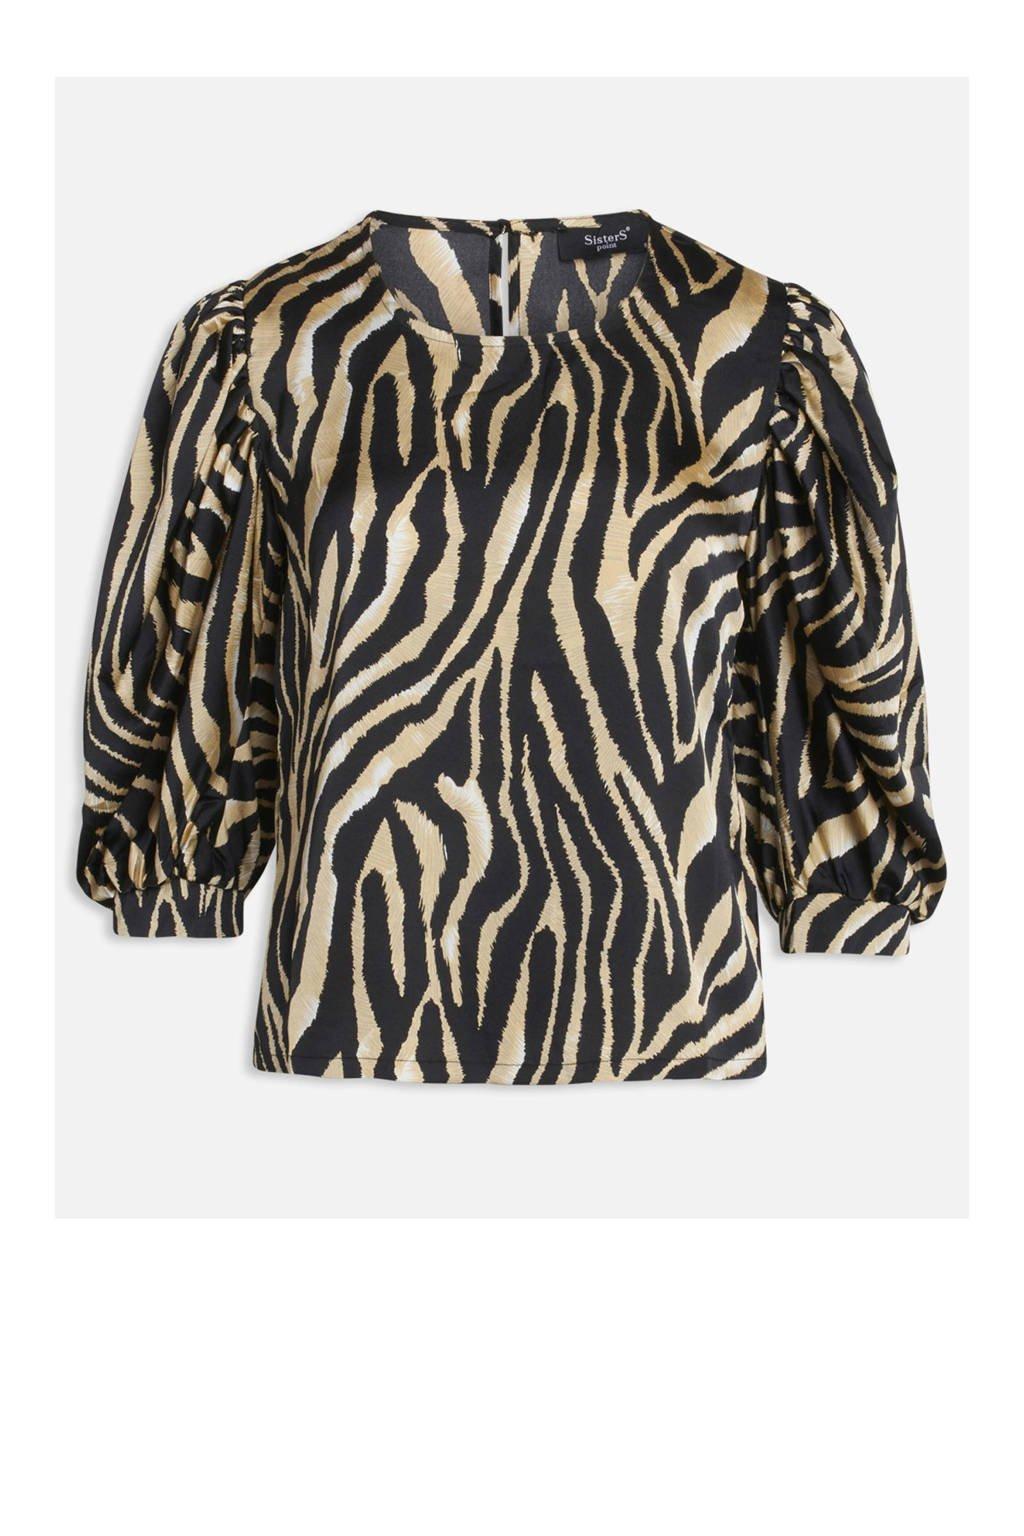 SisterS Point blouse met zebraprint zwart, Zwart